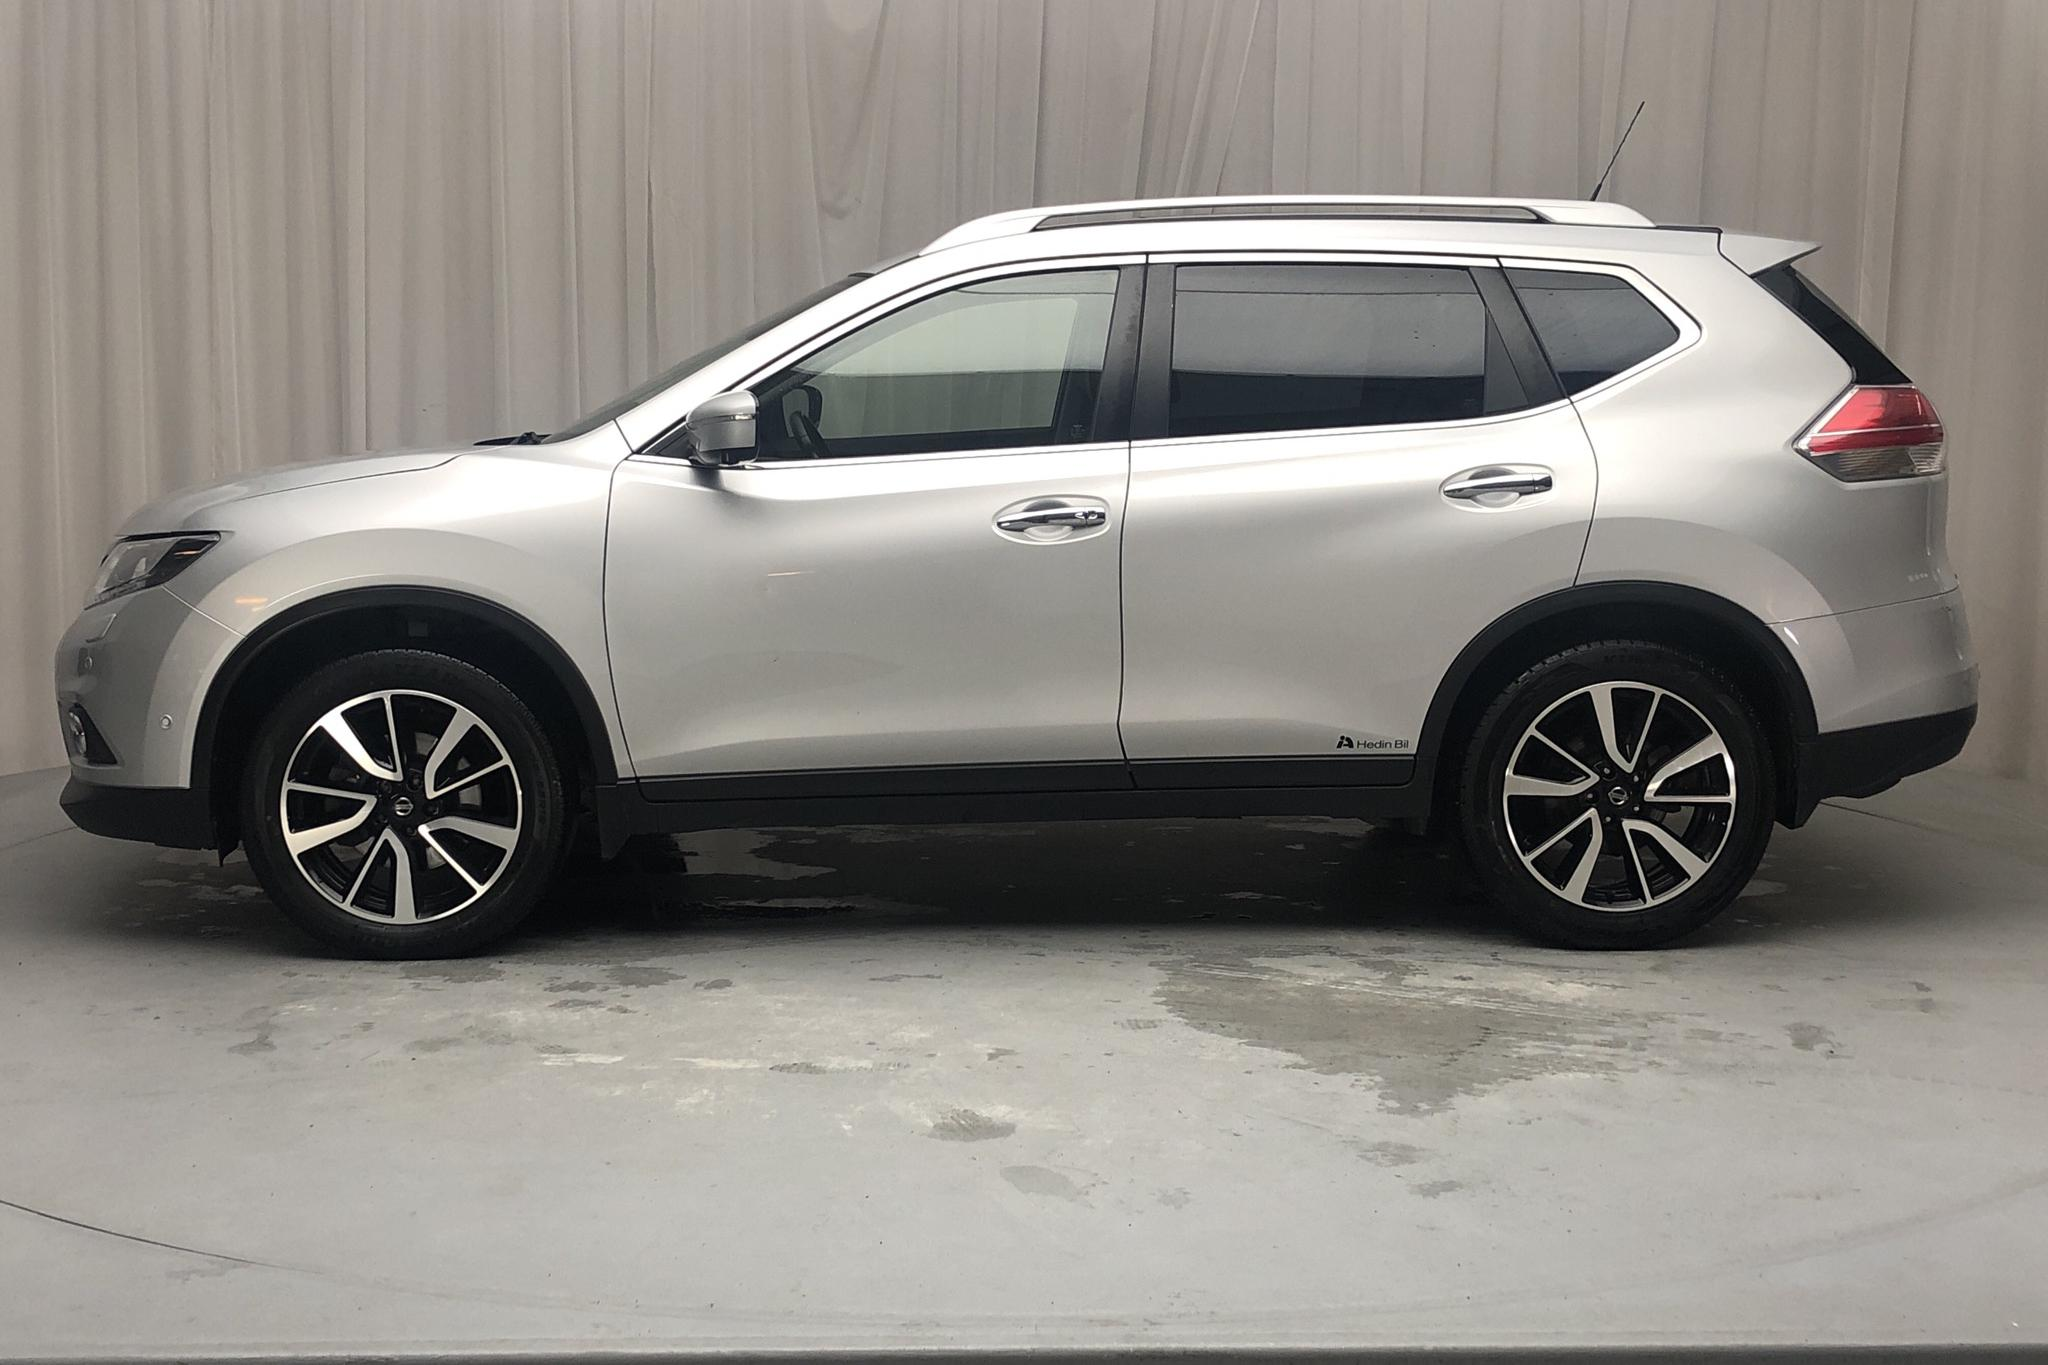 Nissan X-trail 1.6 dCi 2WD (130hk) - 13 547 mil - Automat - silver - 2017